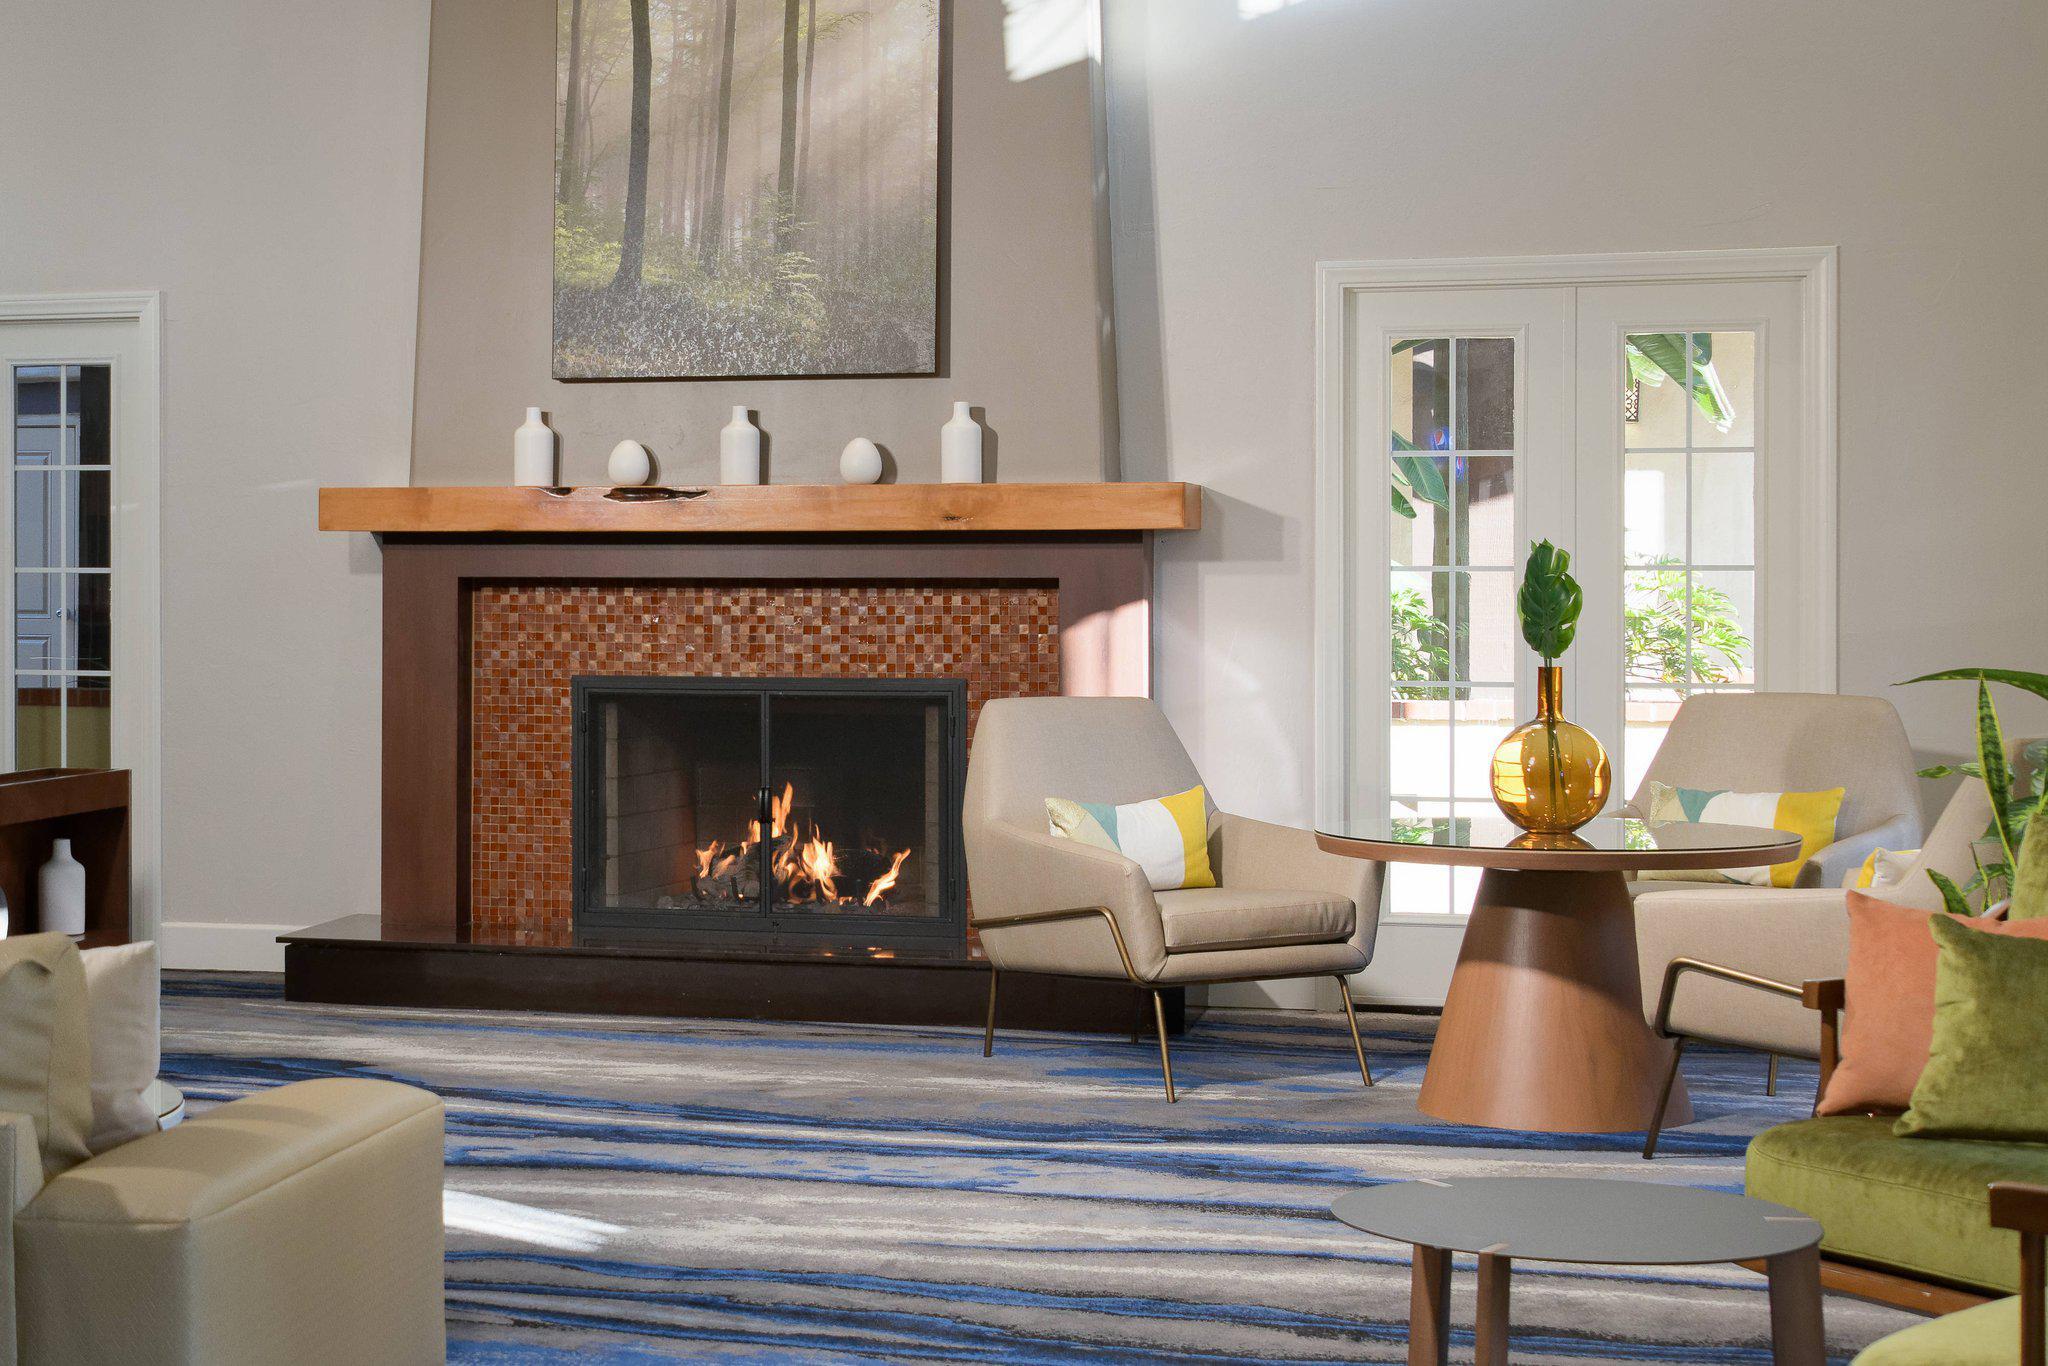 Fairfield Inn & Suites by Marriott San Diego Old Town